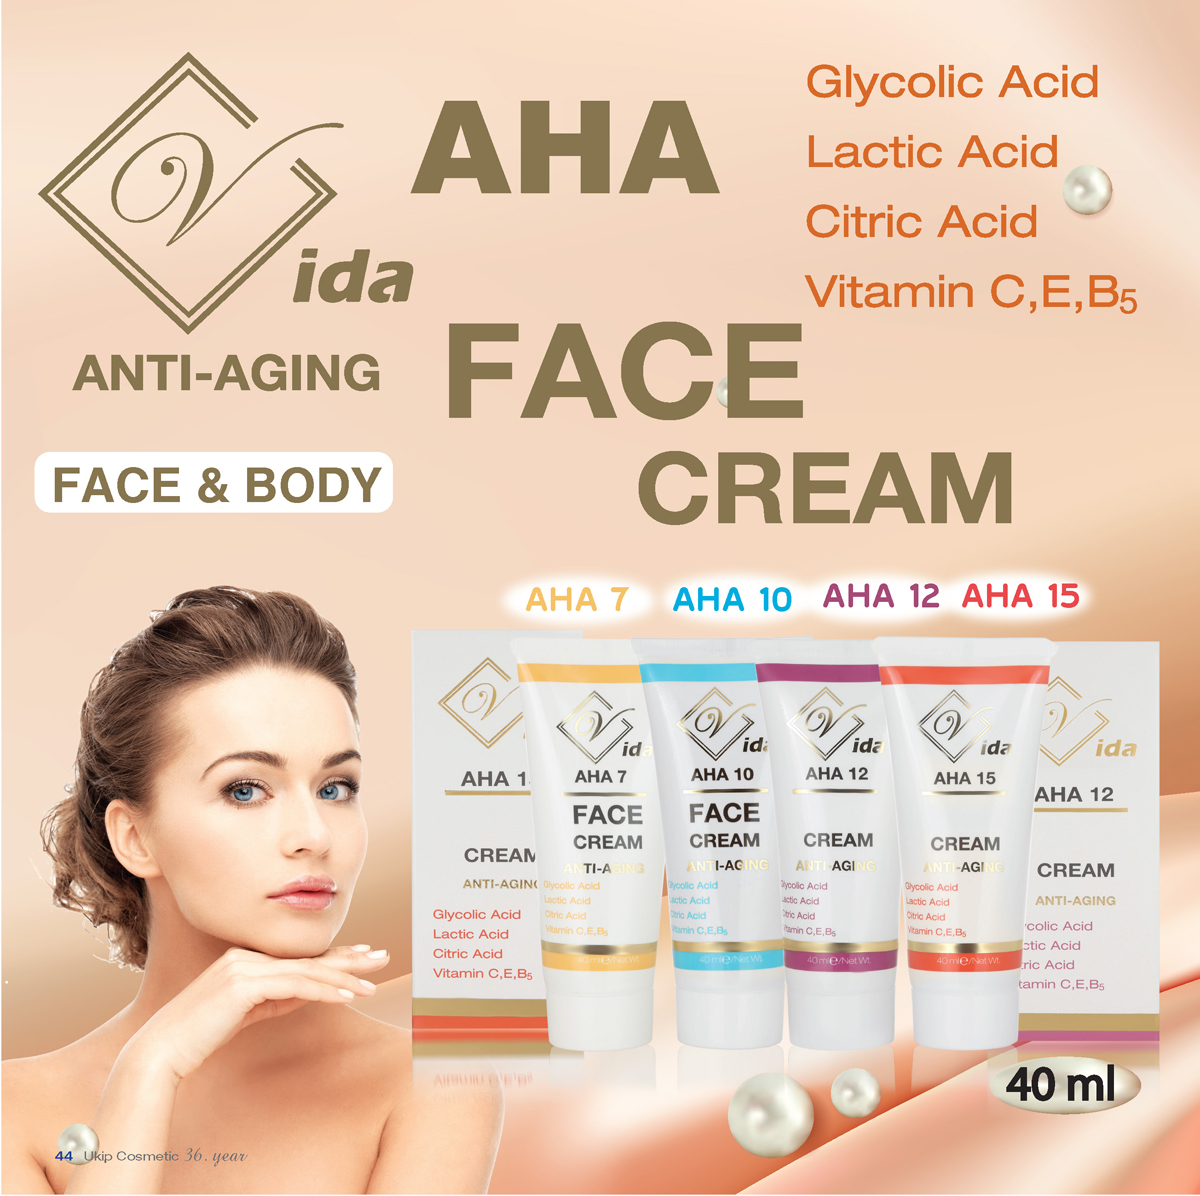 Vida AHA anti - aging face and body cream